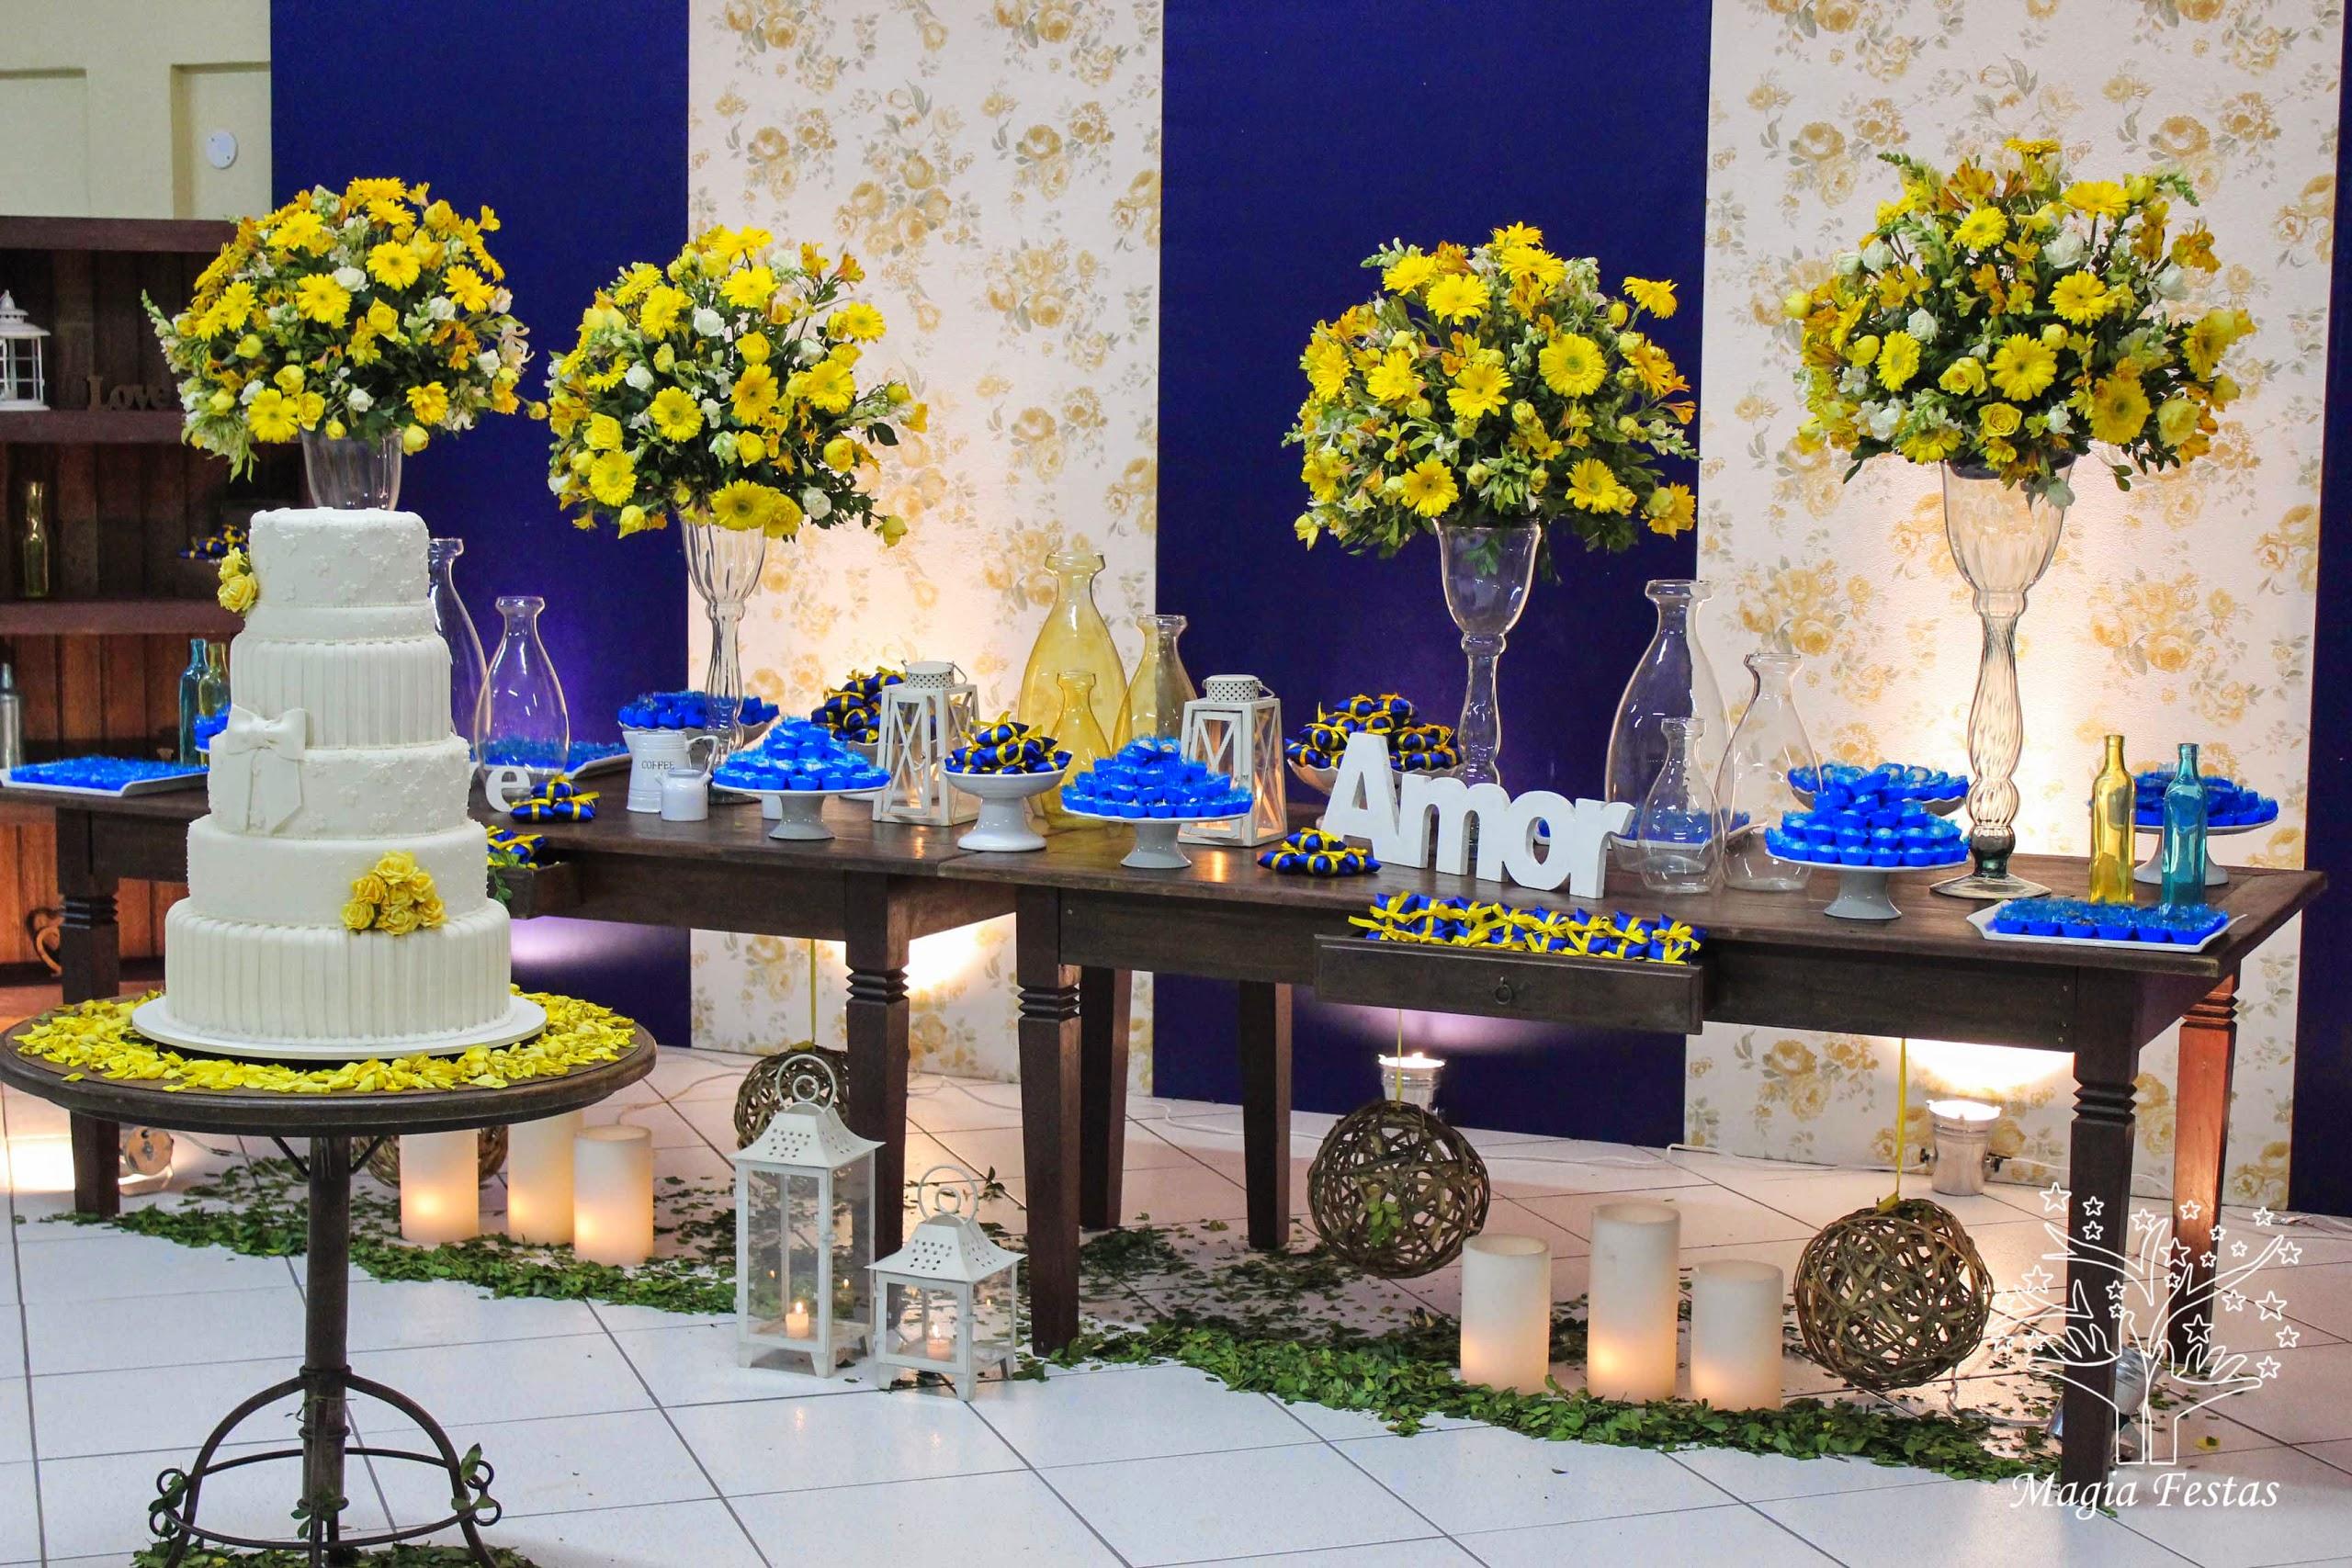 decoracao casamento rustico azul e amarelo: Magia Festas: Evento proprio – casamento rústico amarelo e azul